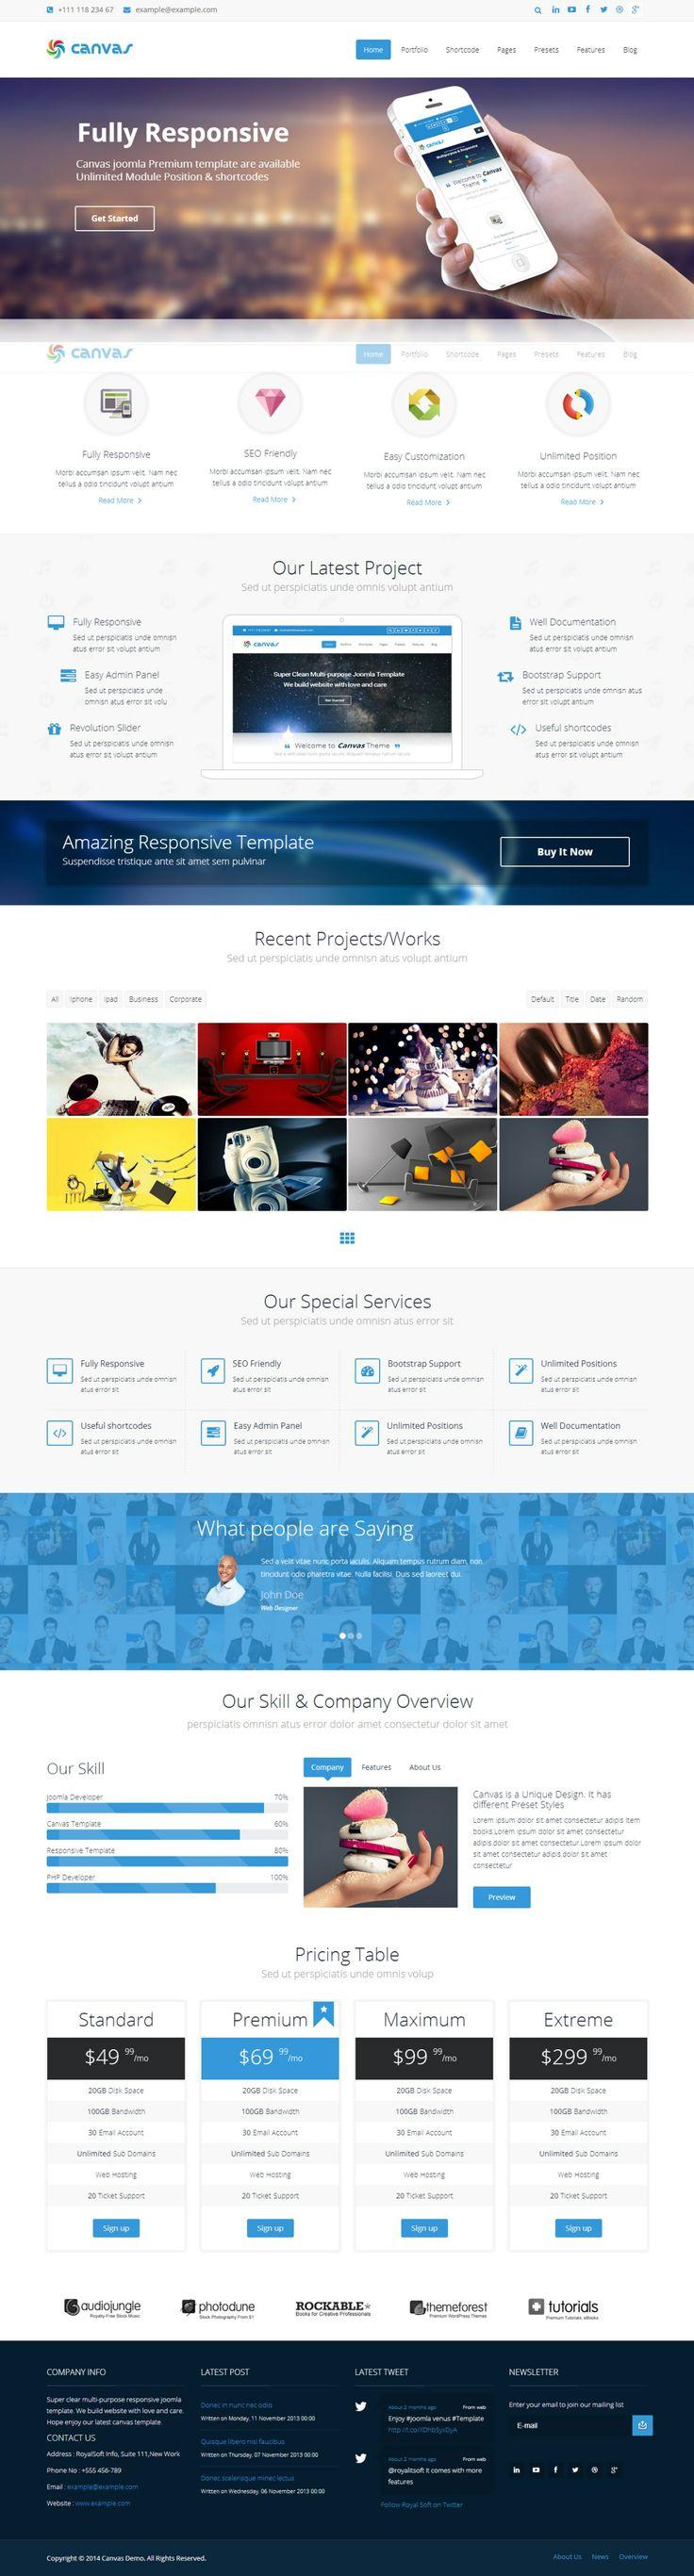 Best 60 Best Professional Joomla Website Templates images on ...